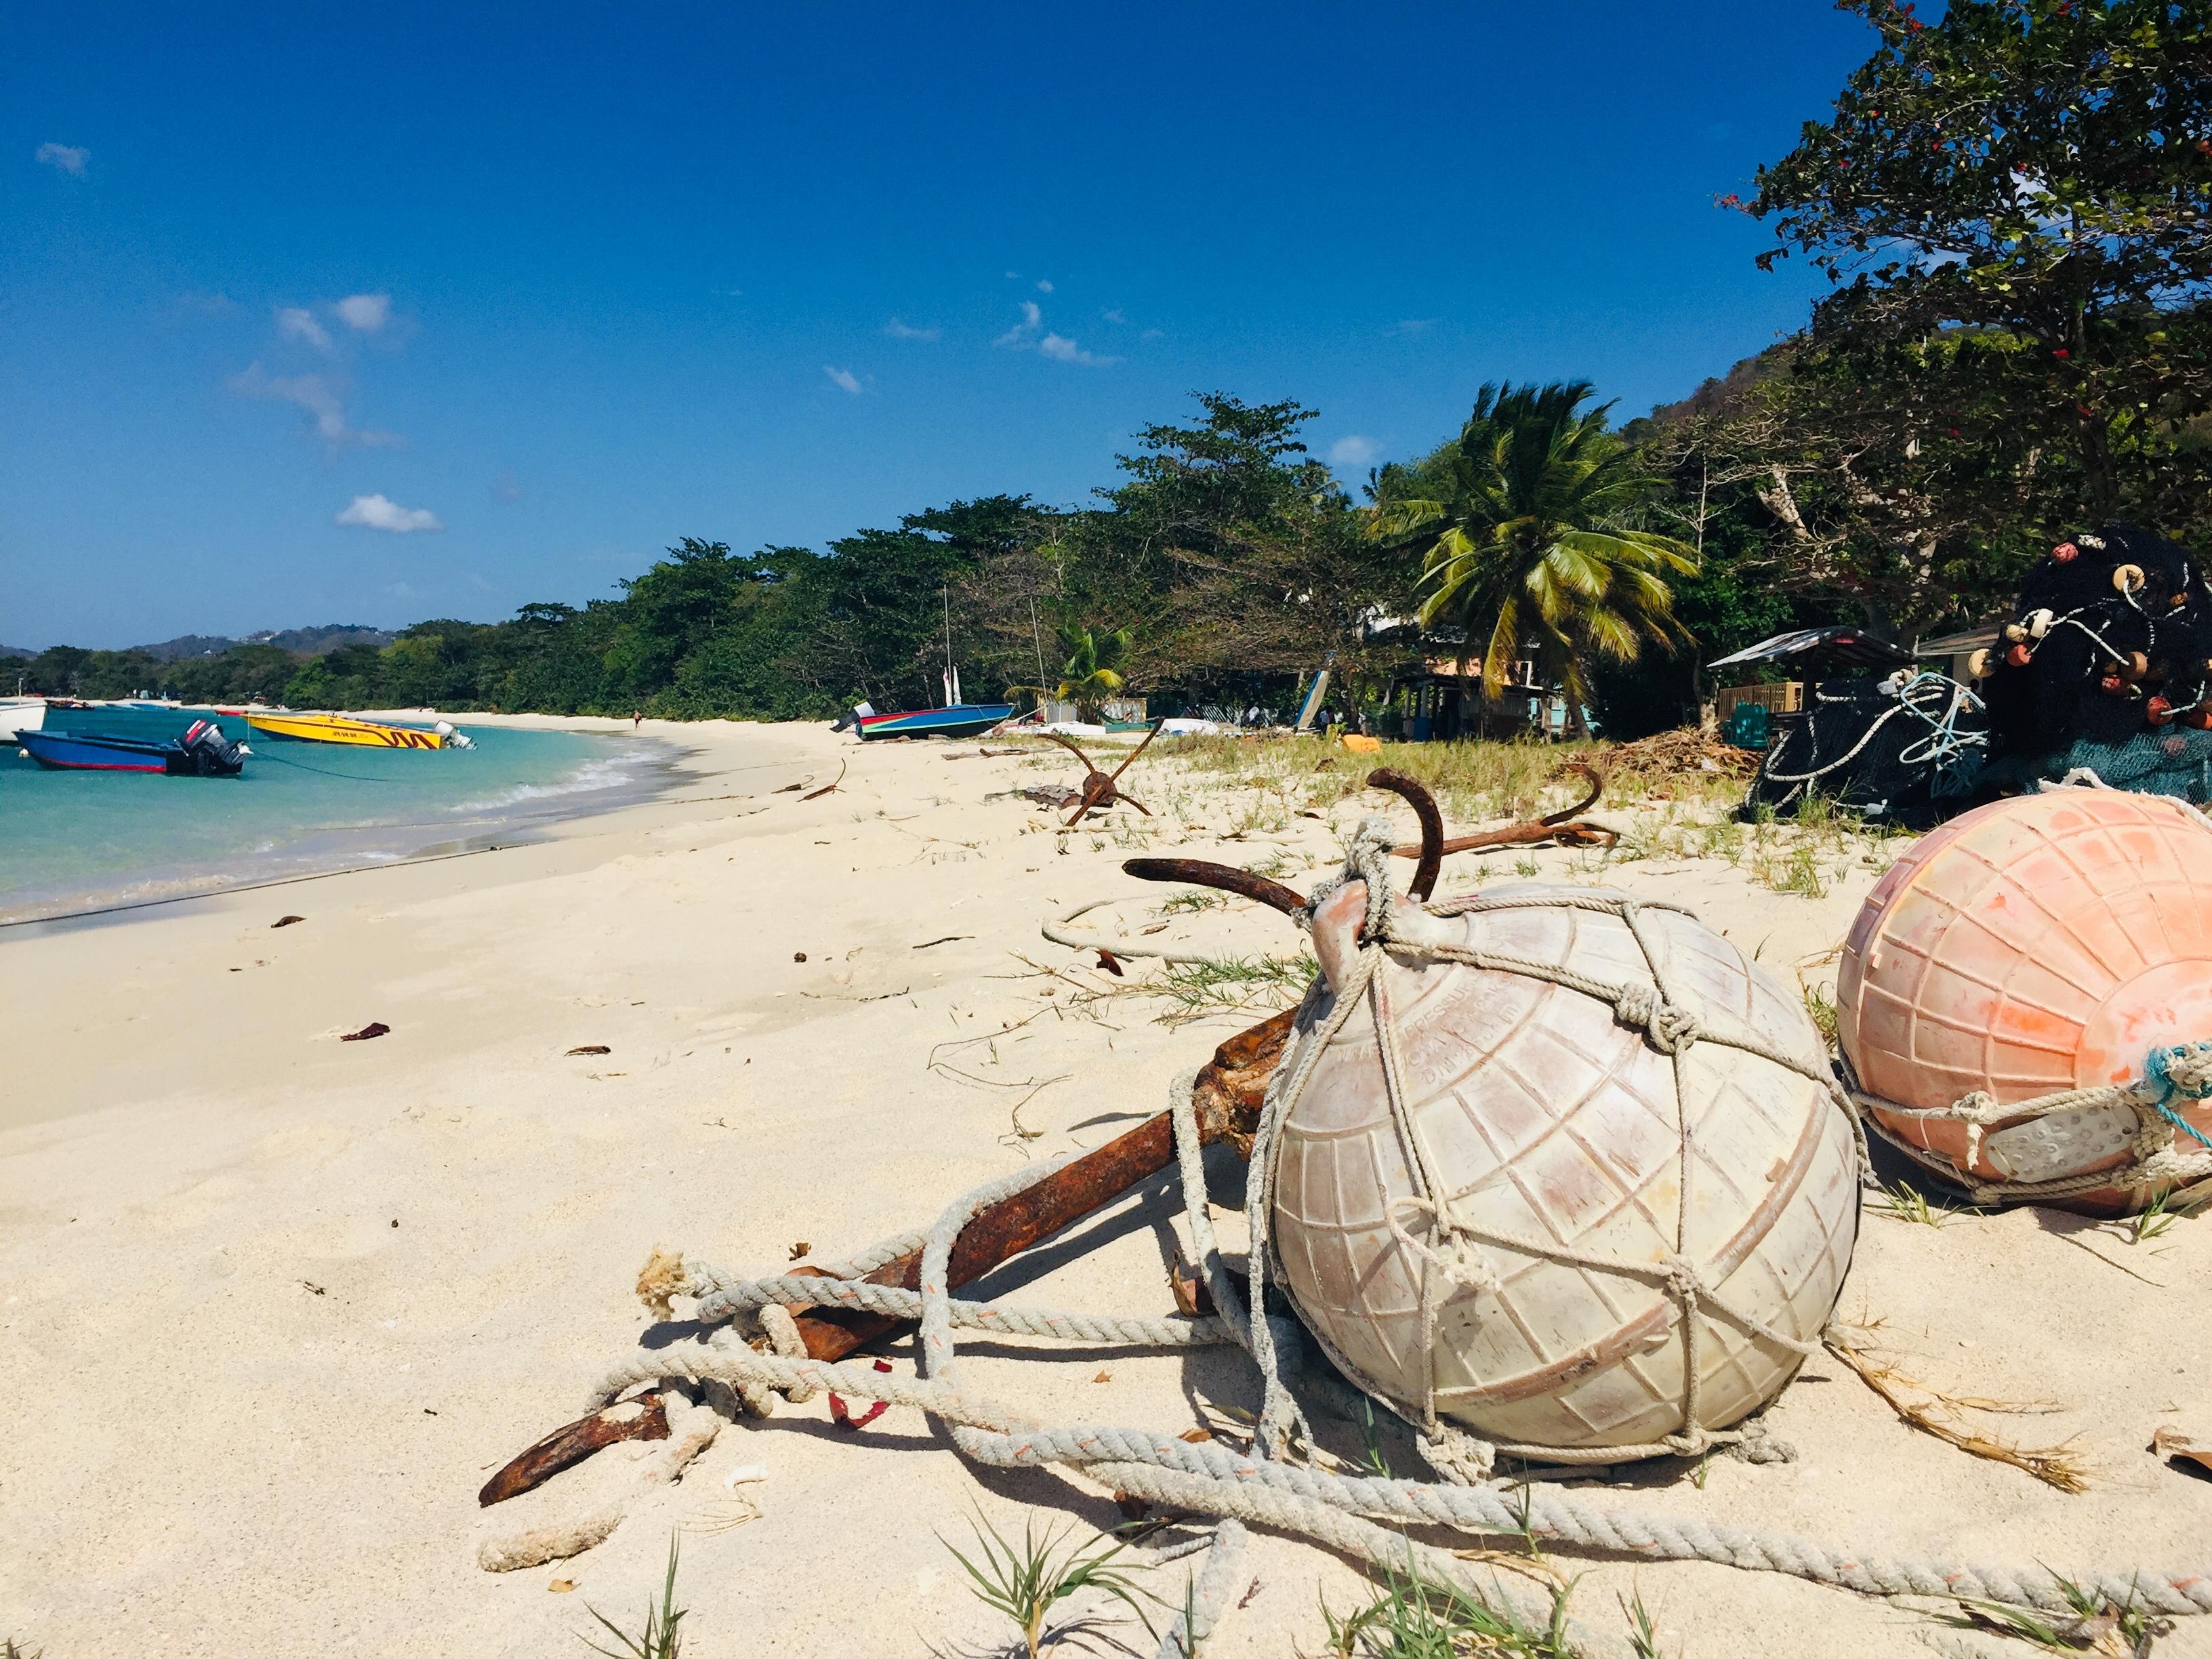 Fishermans base at Paradise Beach Carria